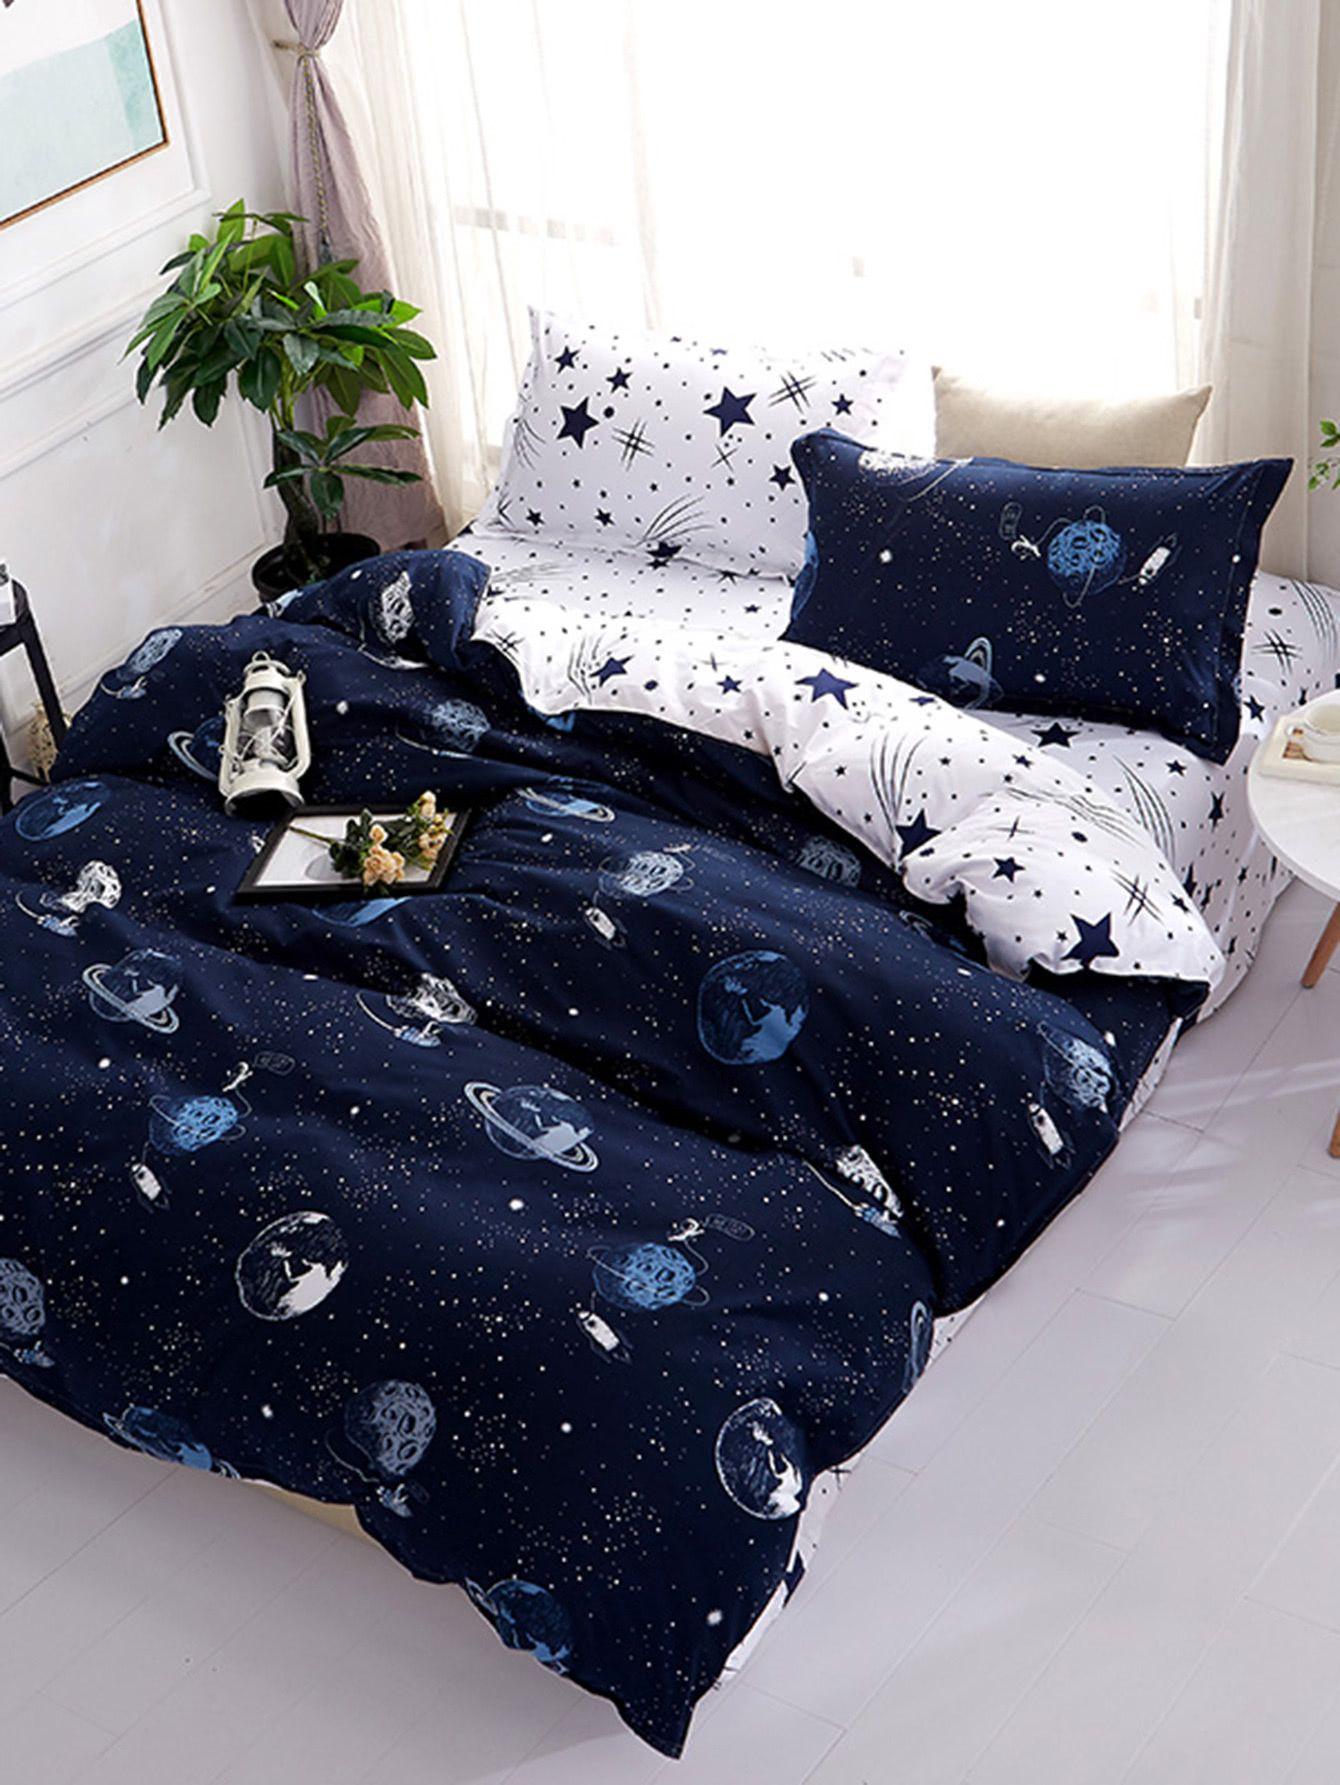 Power Source 1.5m 1.8m 2.0m 2.2m Bed Sheet 4 Pcs Bedding Set King Queen Twin Double Single Size Duvet Cover Pillowcase Beds Set Kids Bedlinen Beautiful In Colour